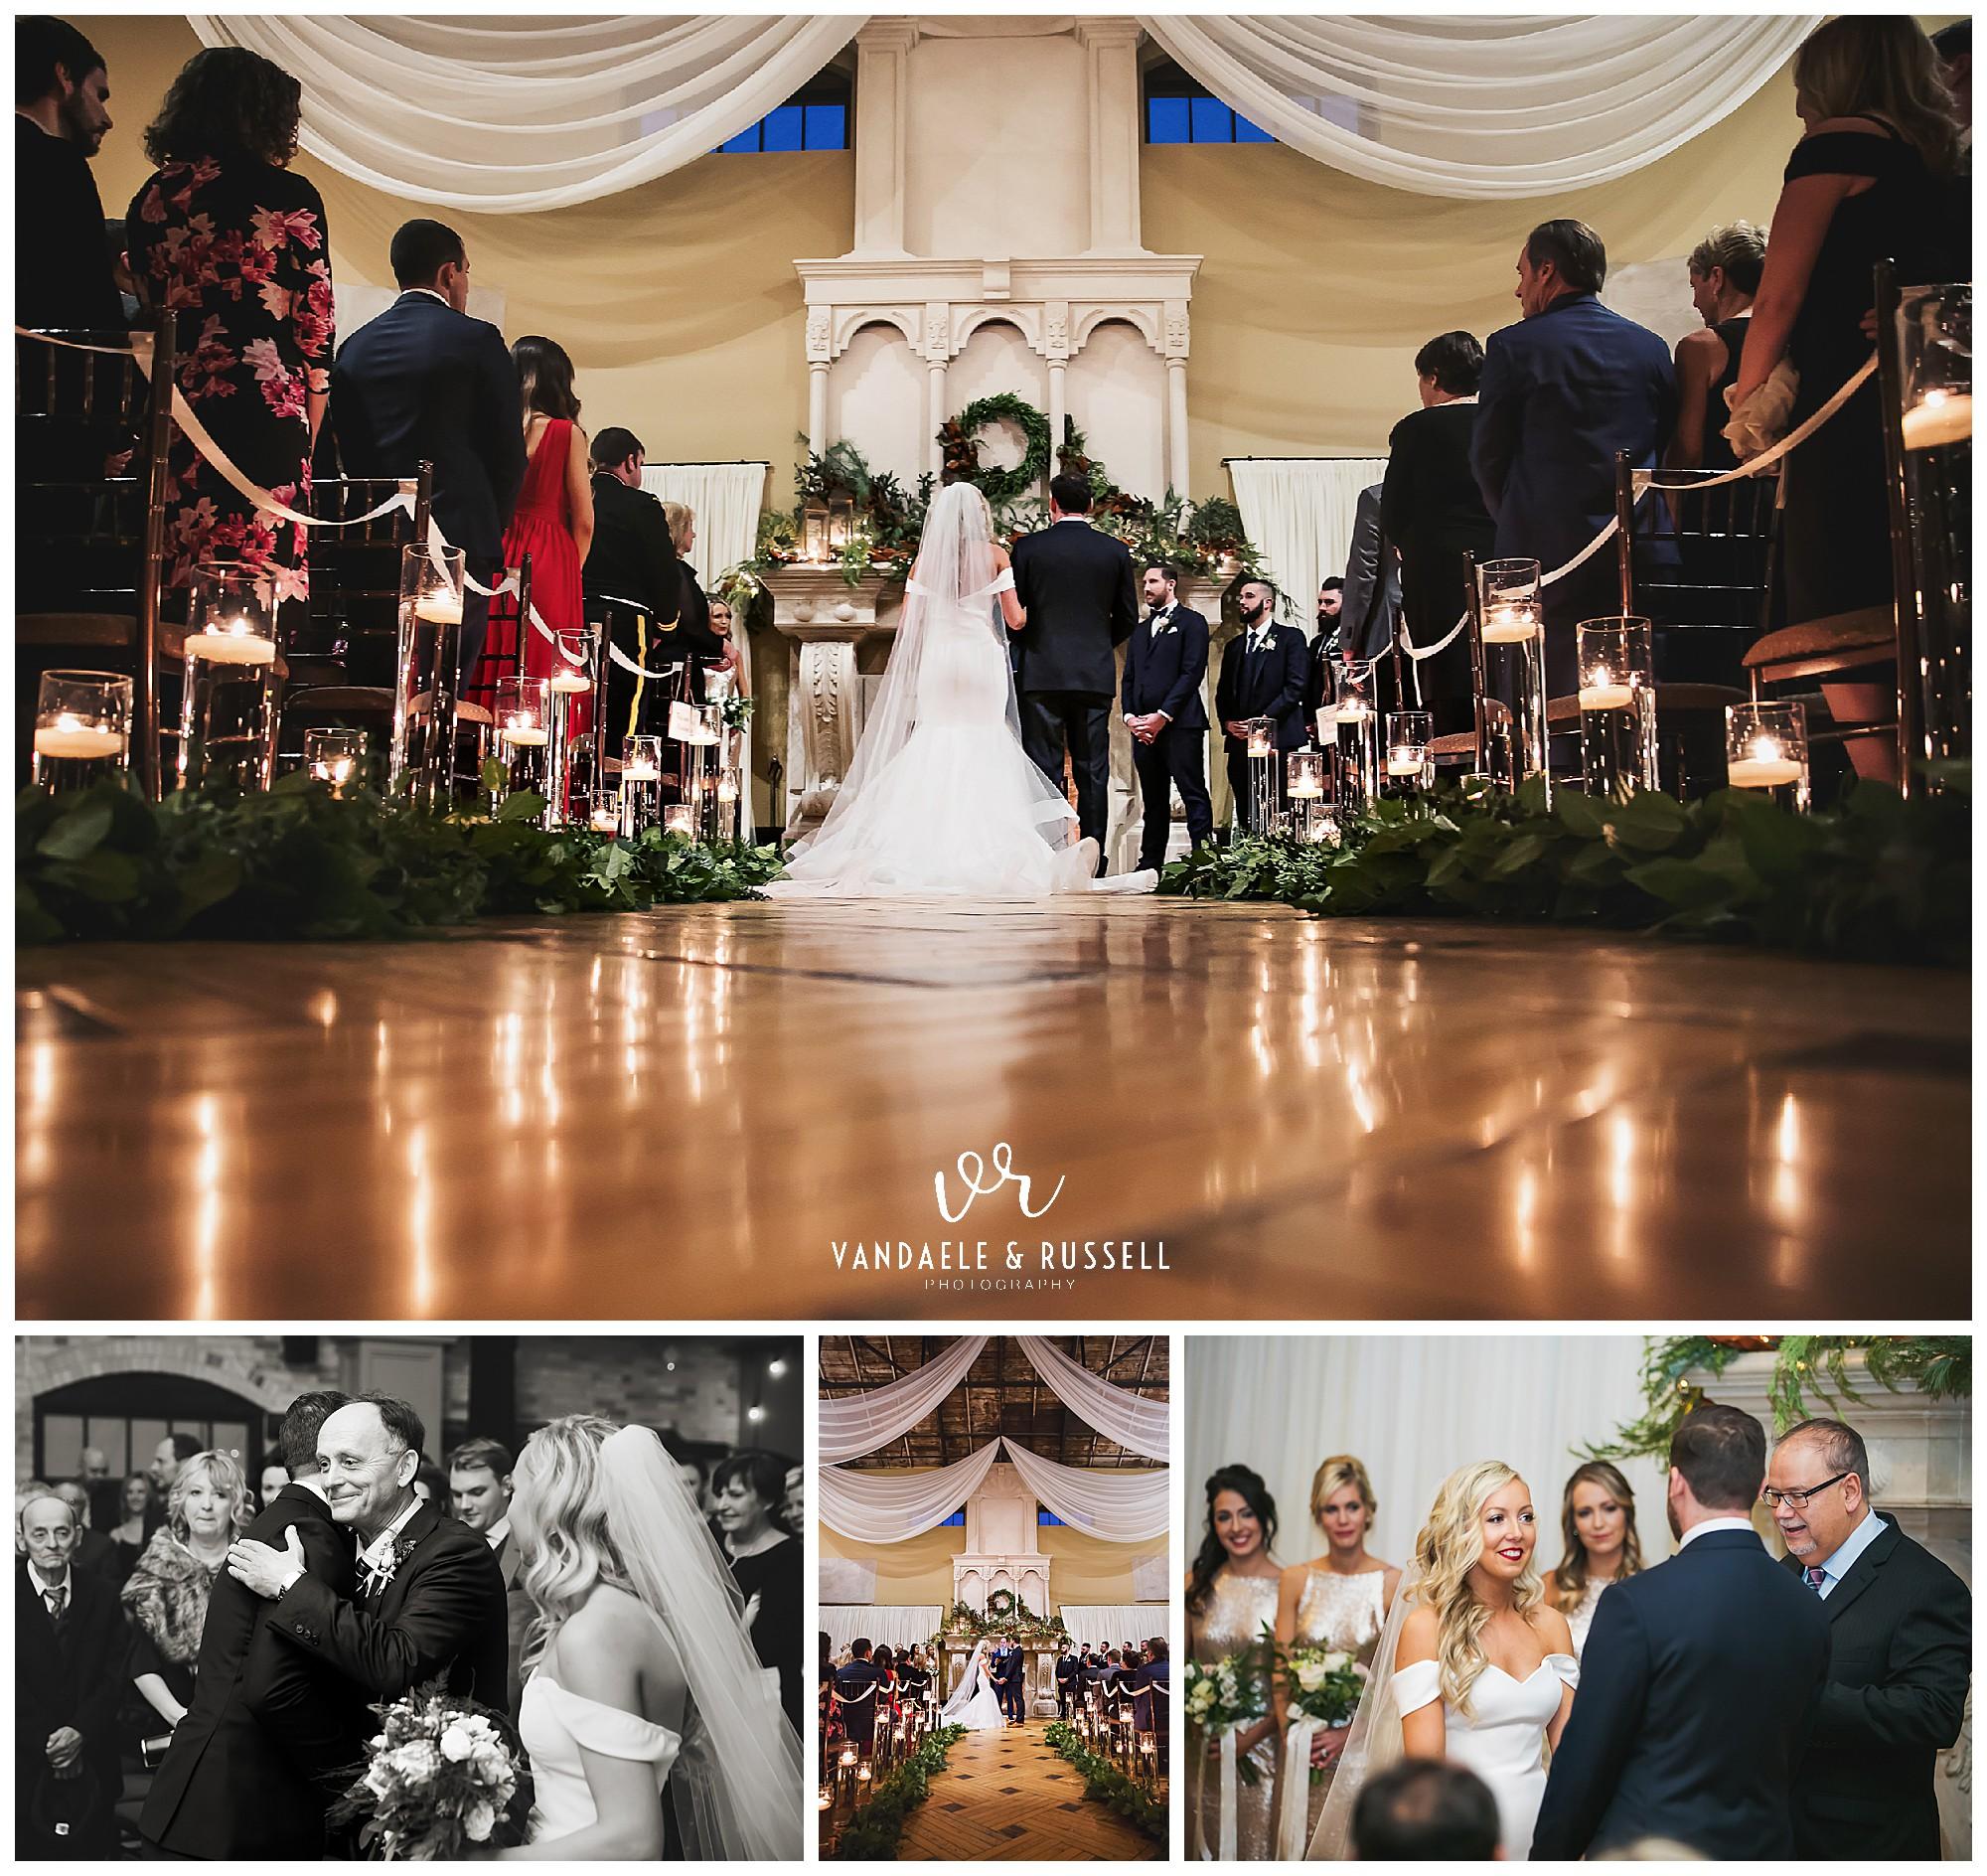 Hacienda-Sarria-Wedding-Photos-NYE-Michelle-Matt-VanDaele-Russell_0031.jpg